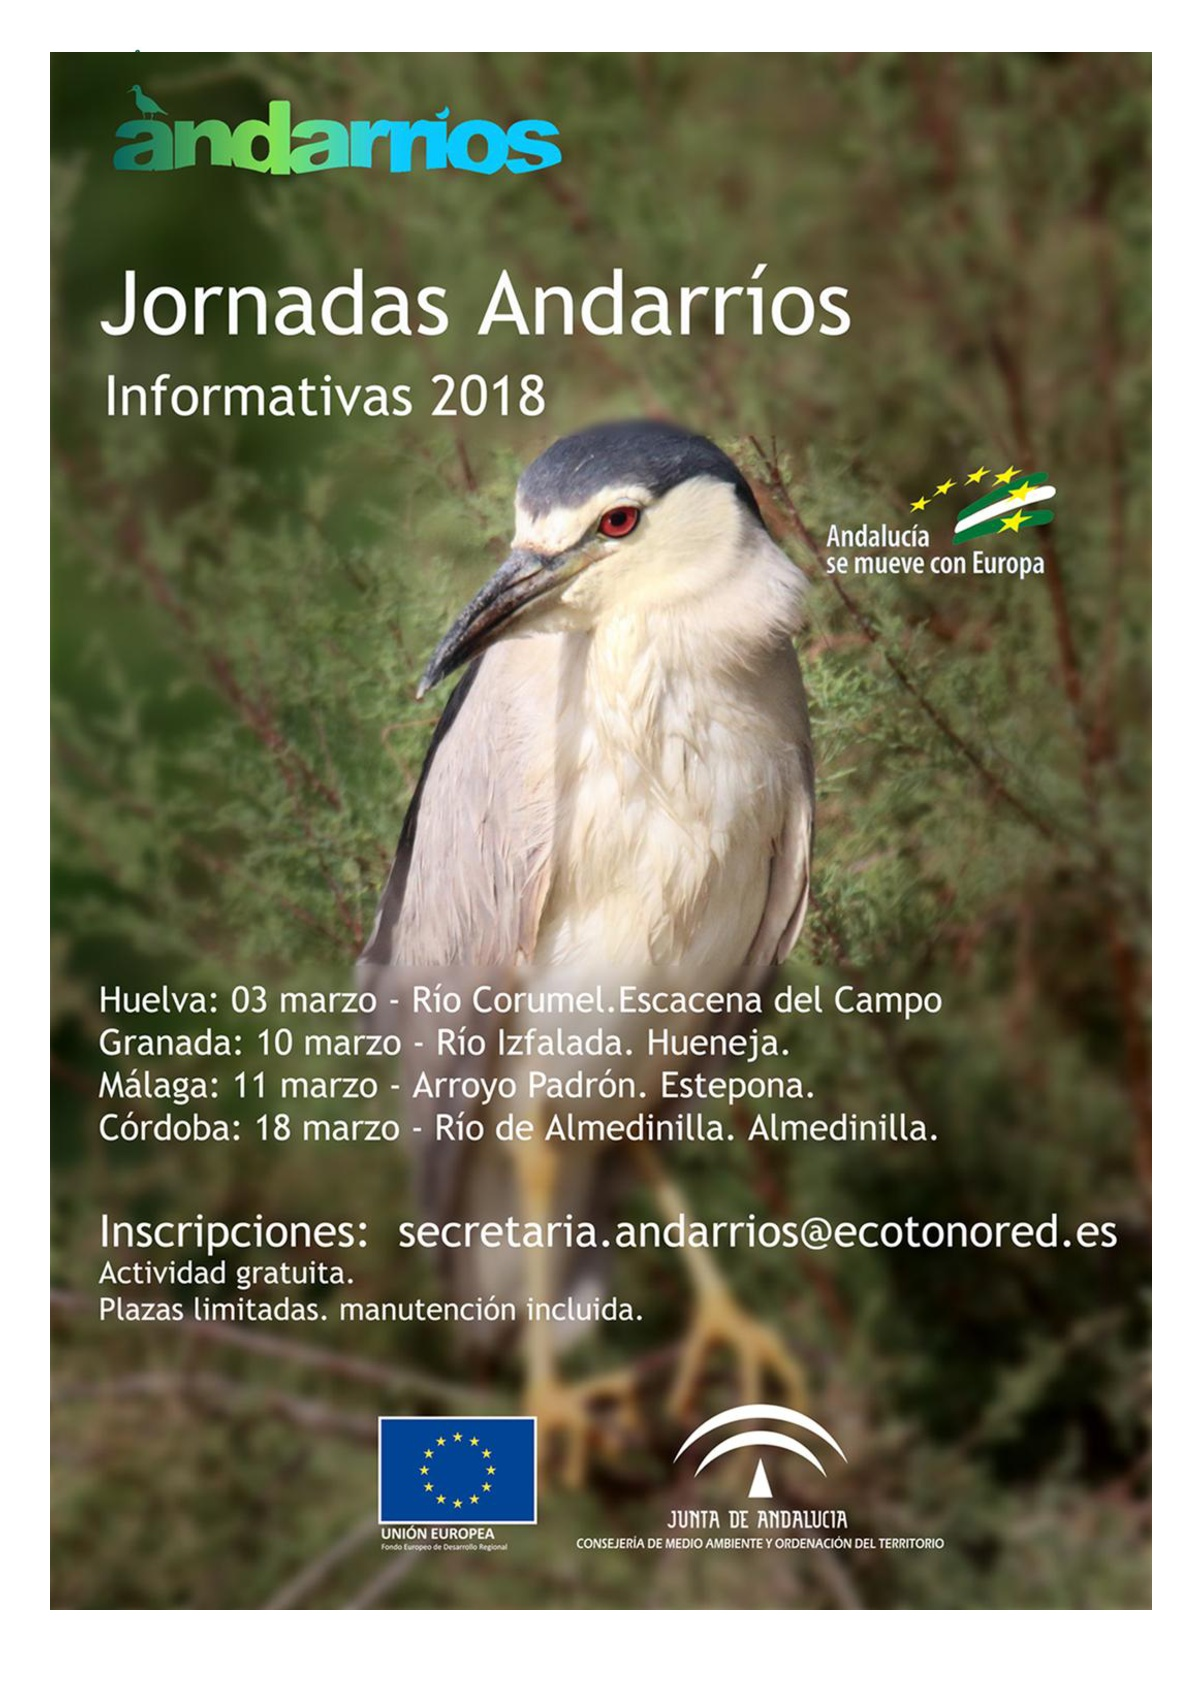 JORNADAS ANDARRIOS 2018